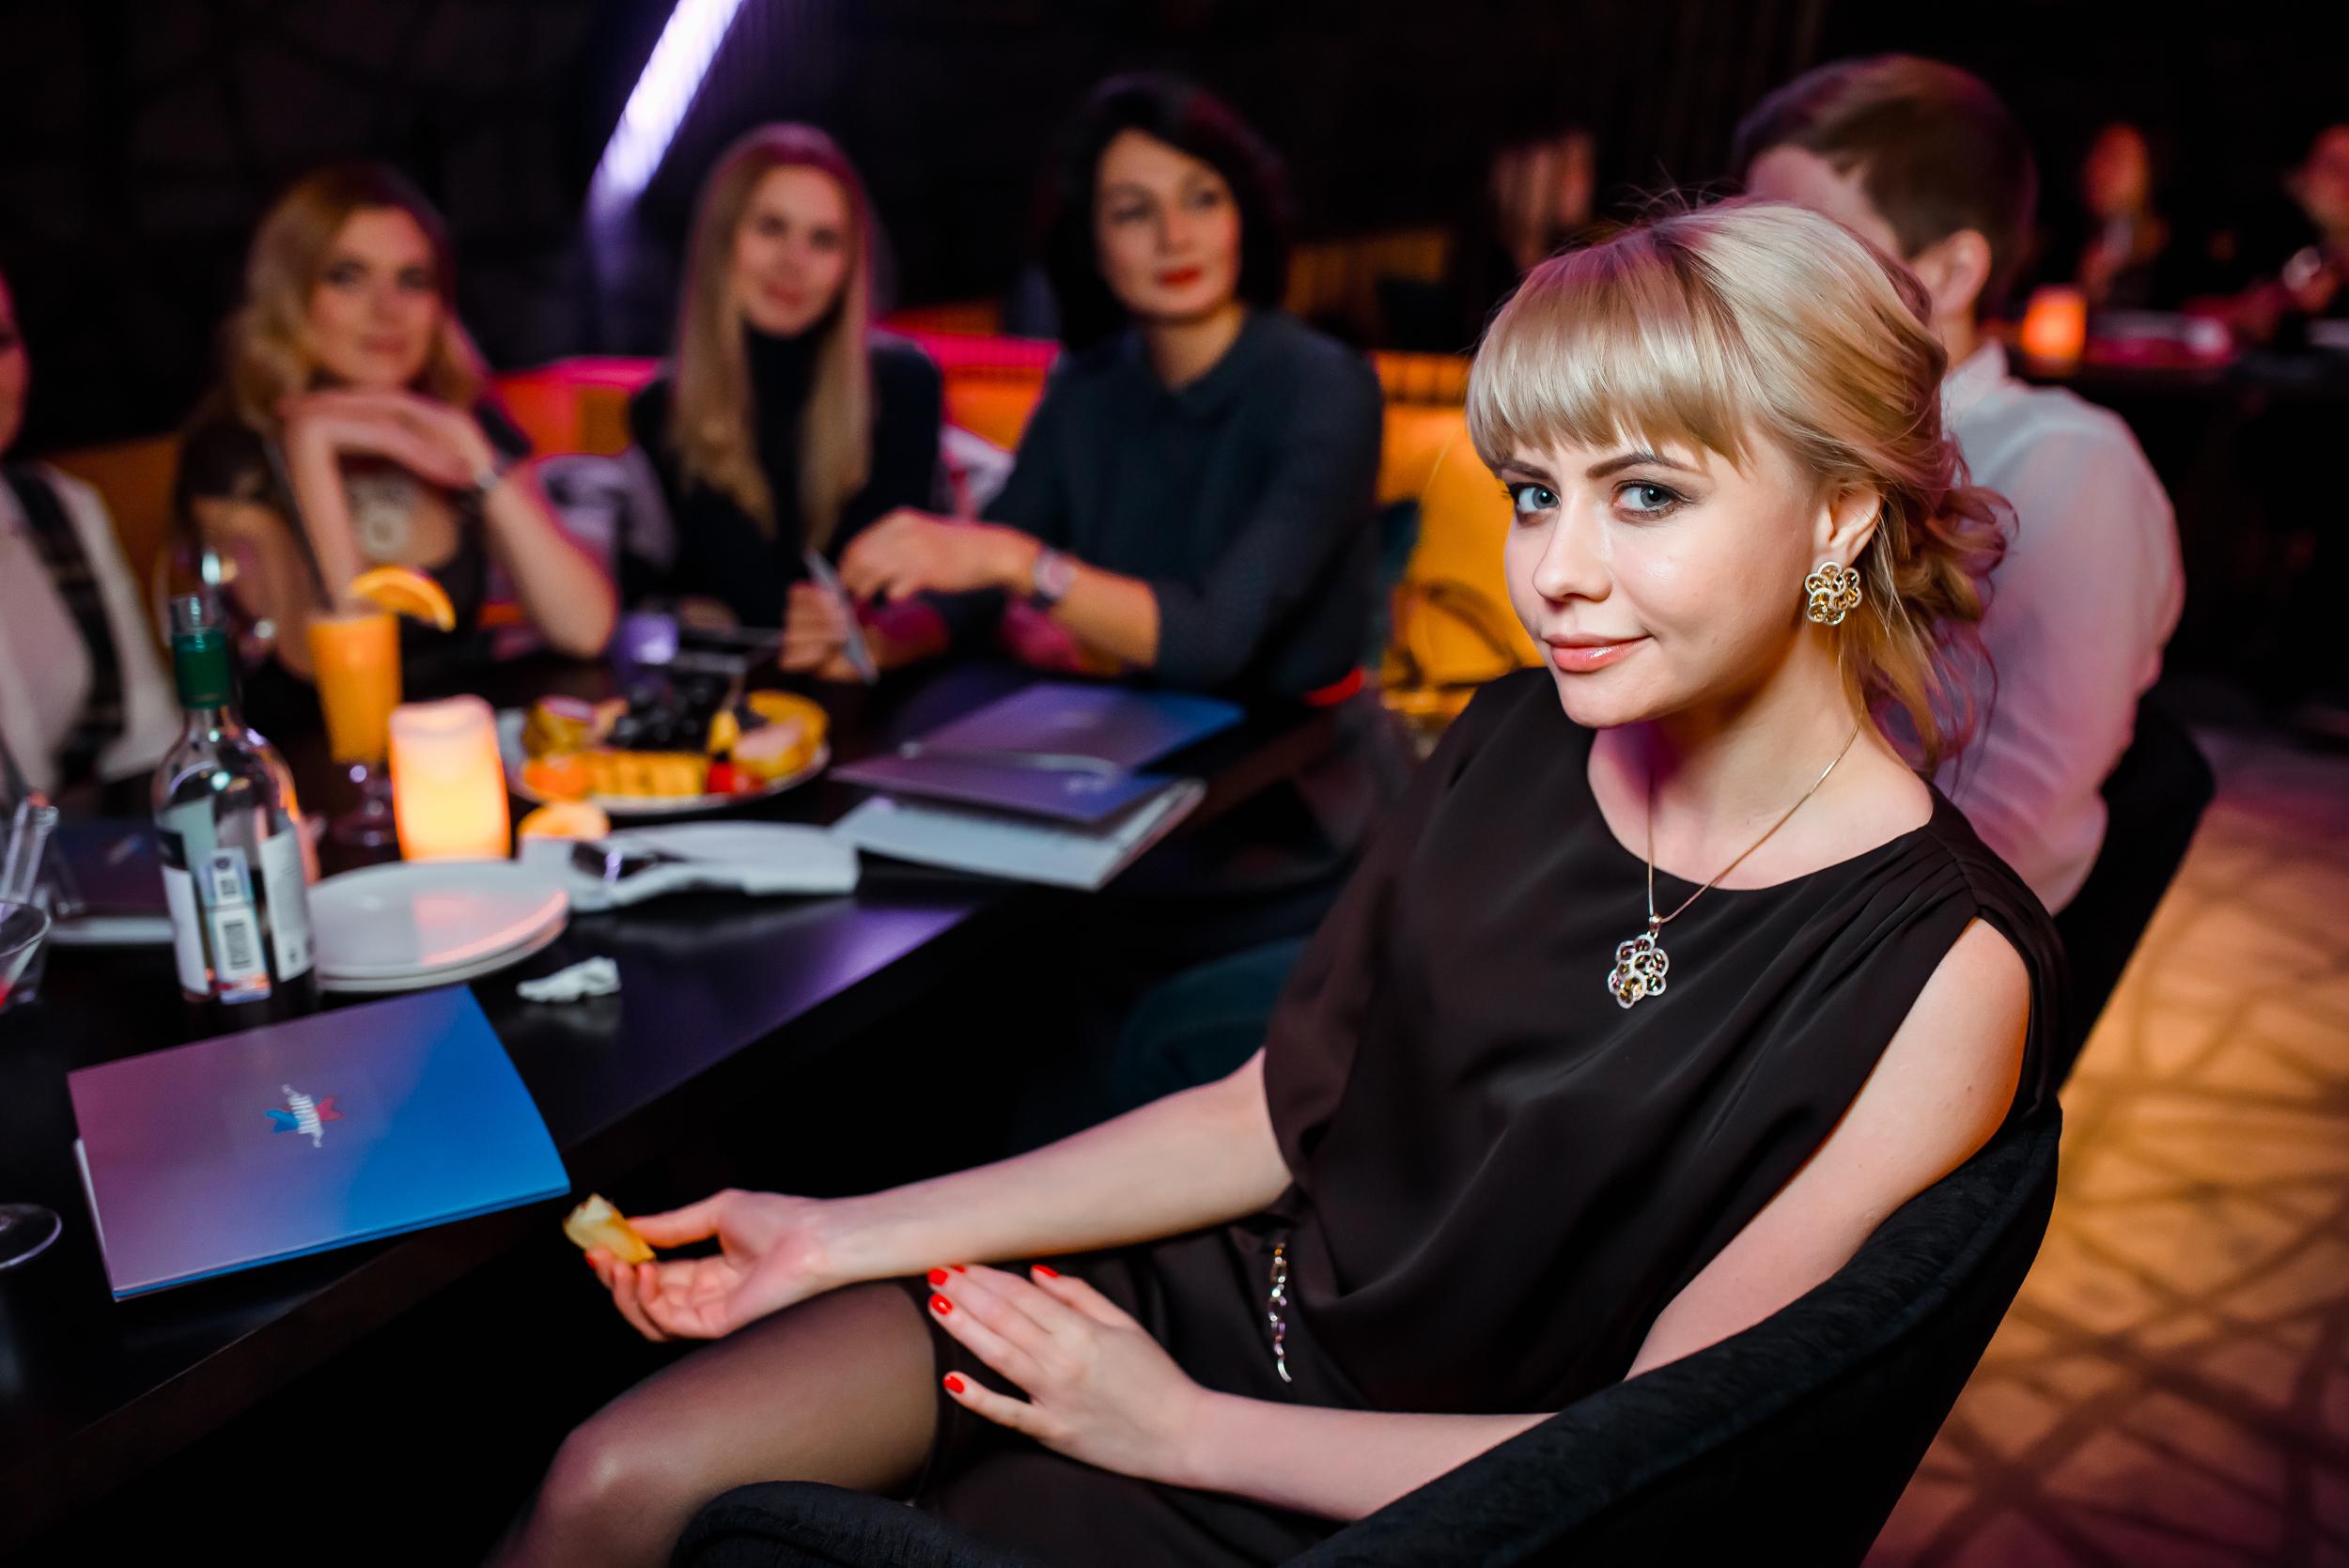 053_2015-02-26_21-59-05_Kiseleva.jpg